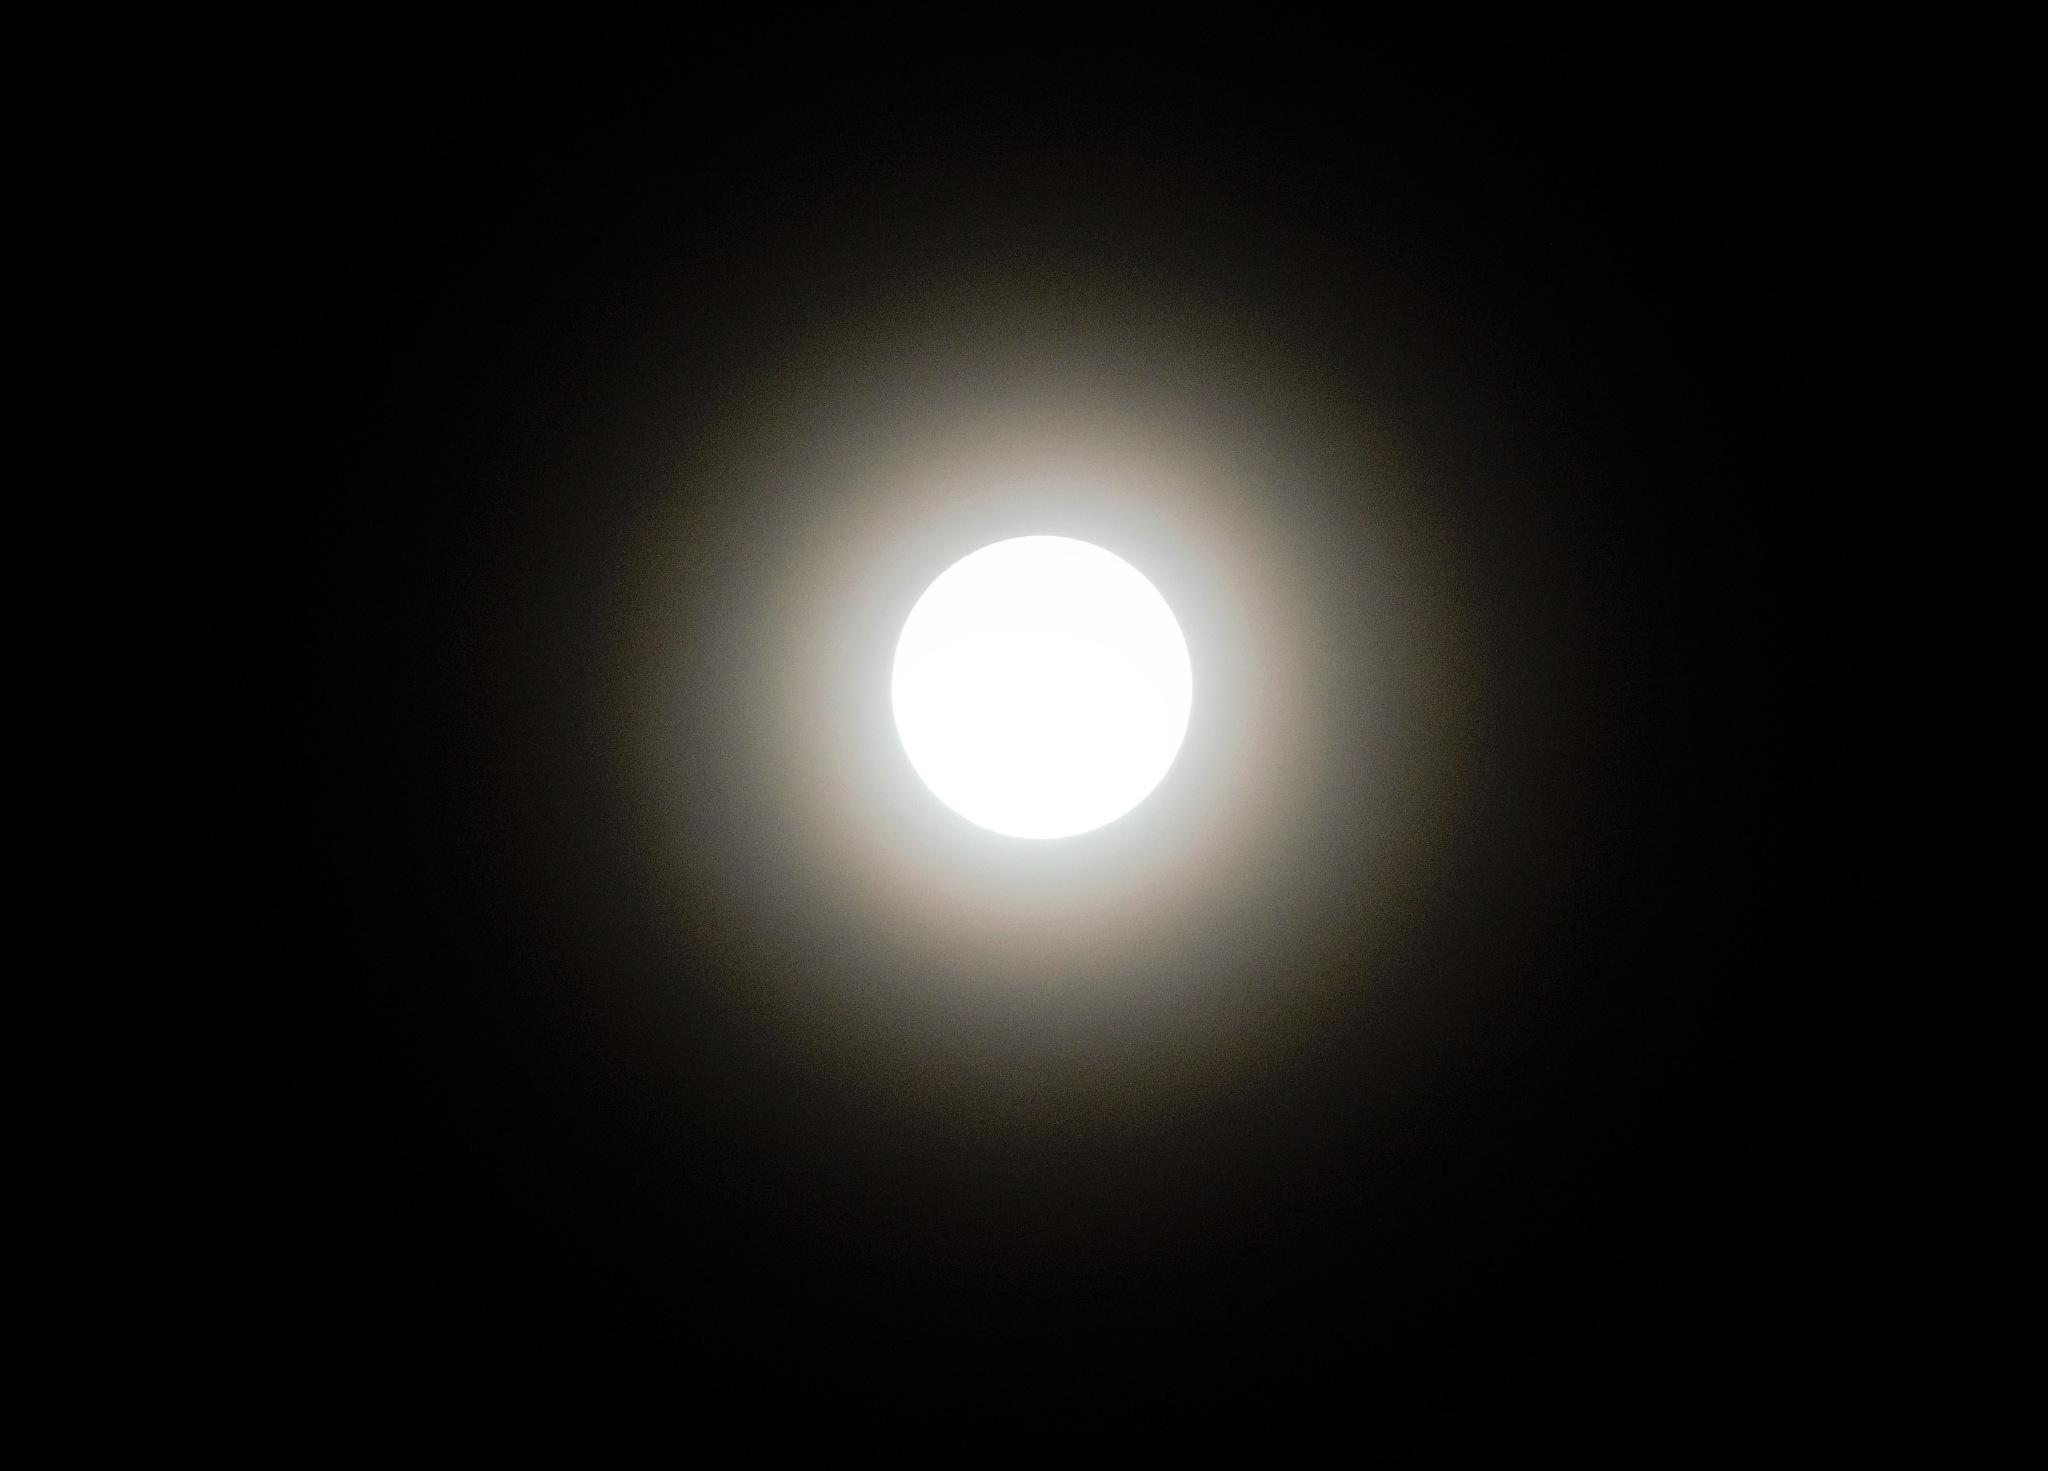 Full Moon by PallabBhattacharjee